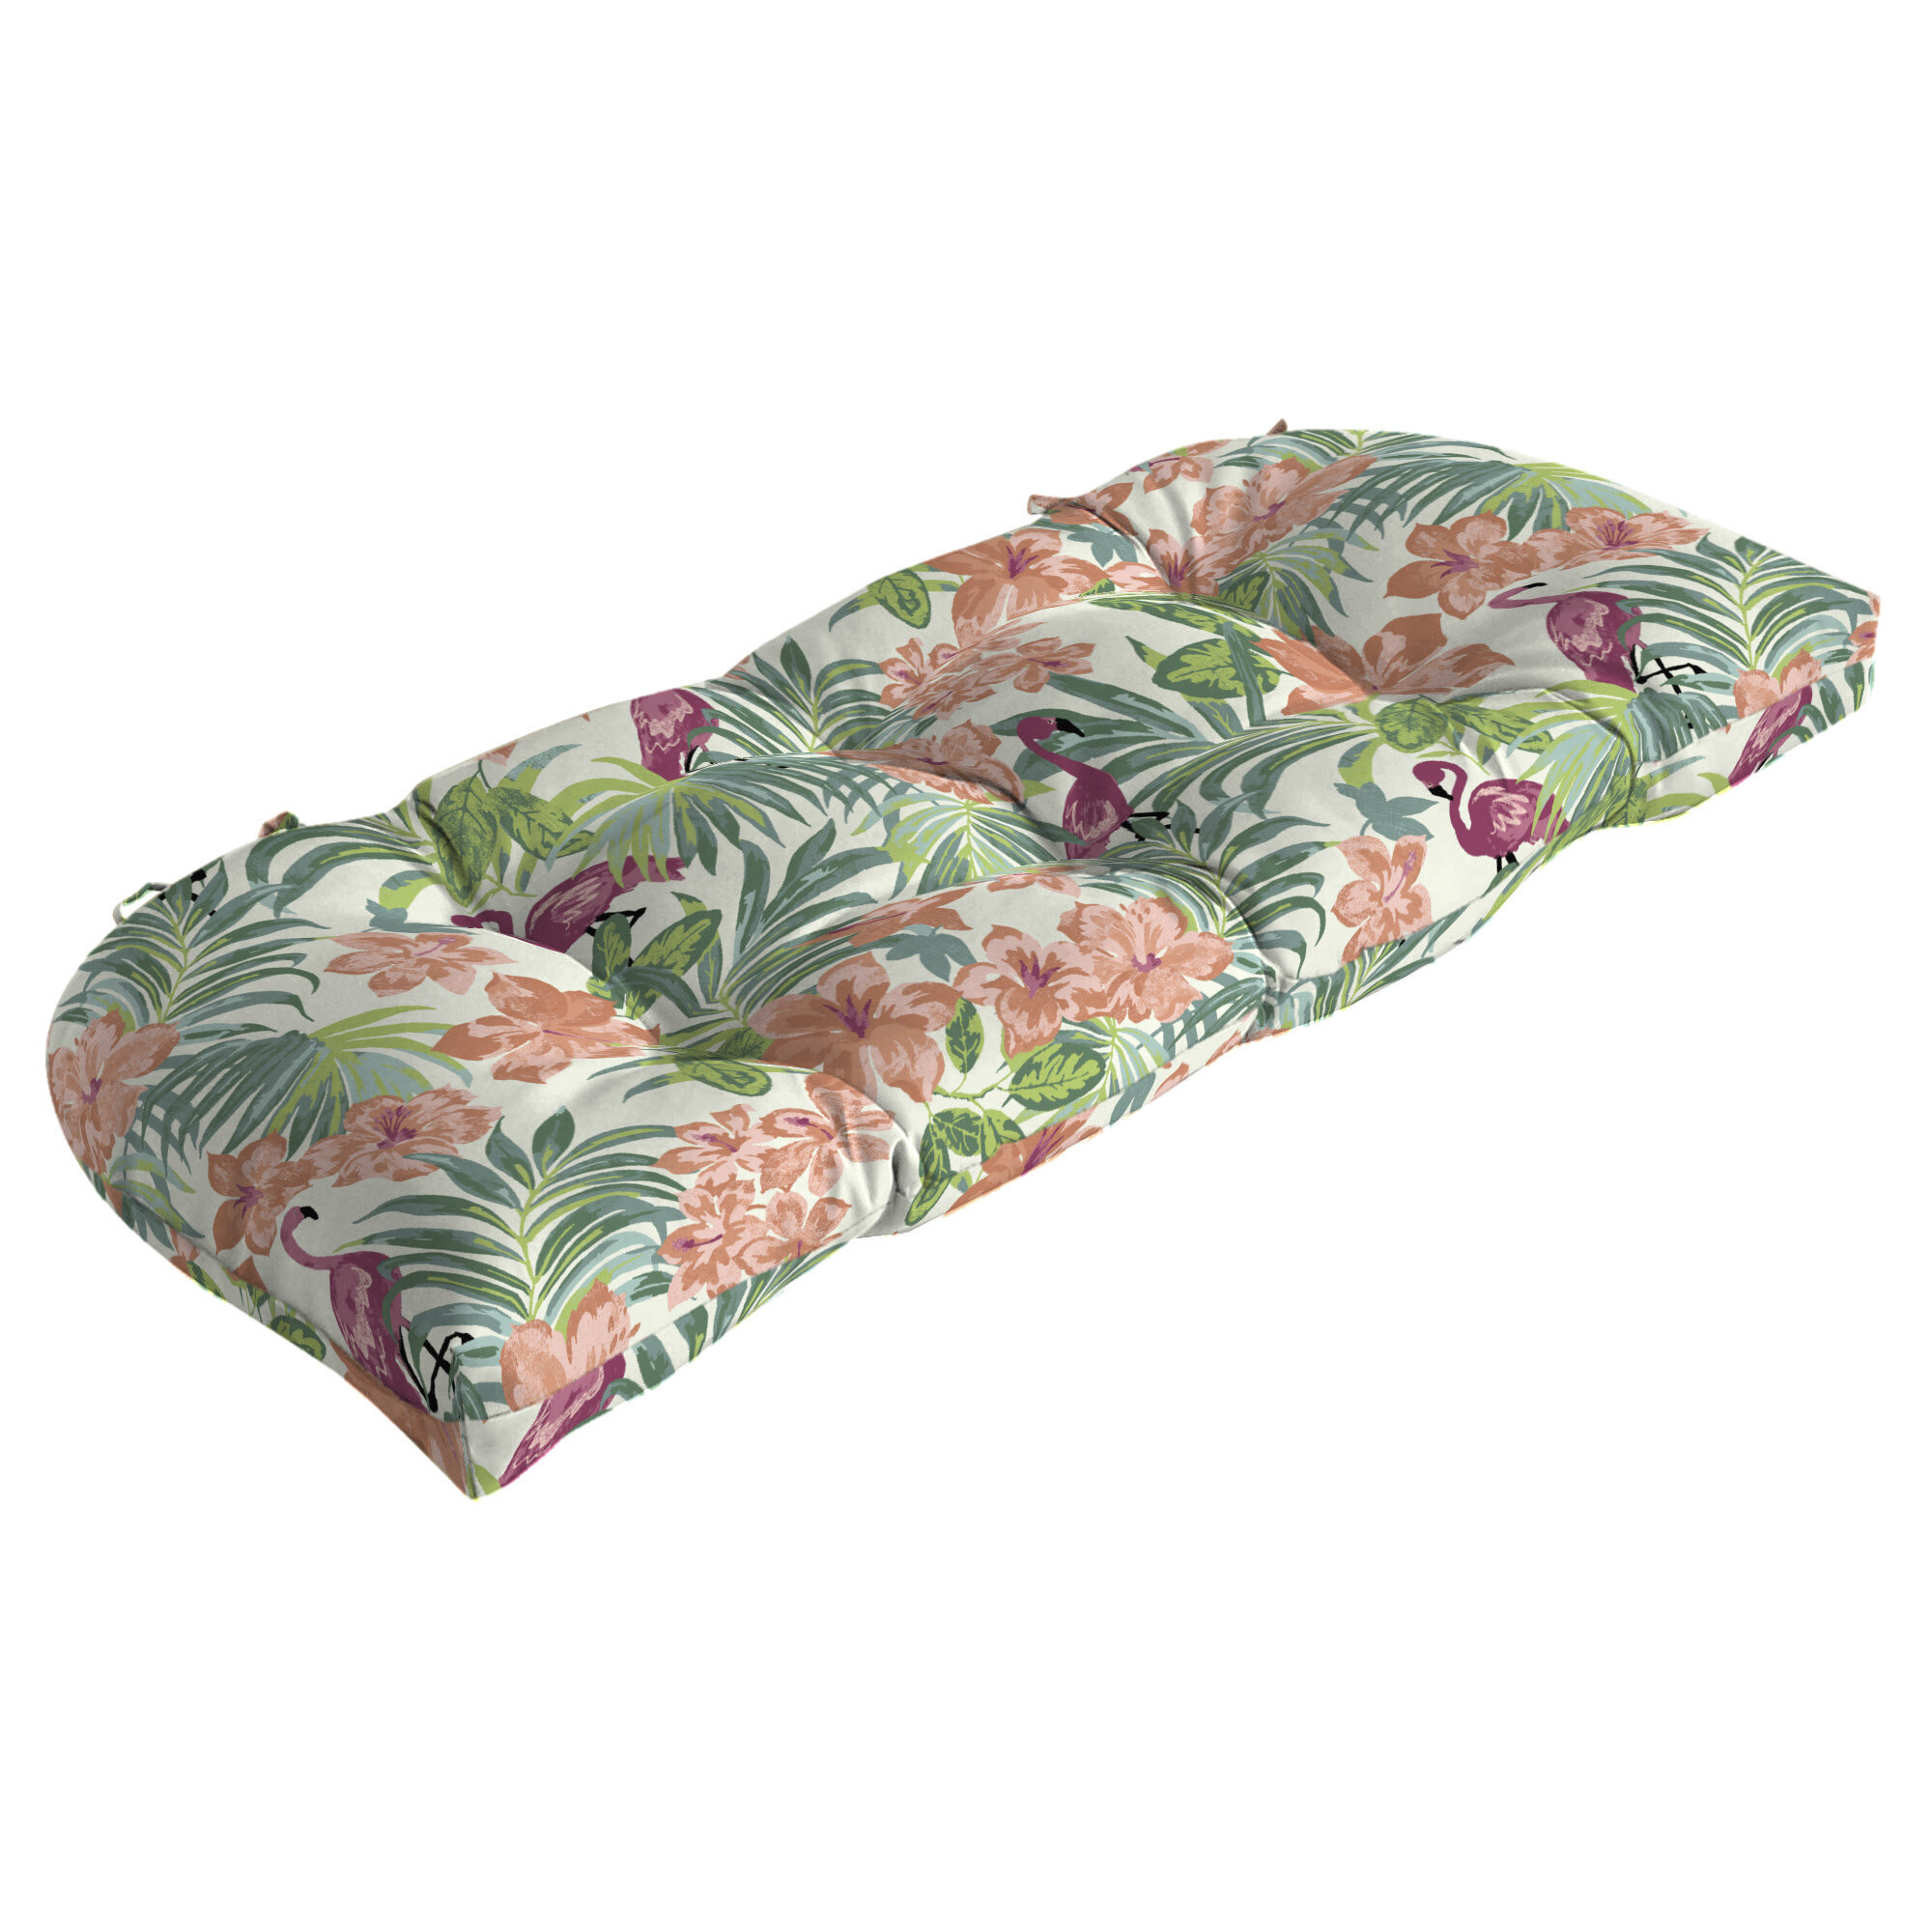 Wondrous Flamingo Tropical Outdoor Bench Cushion Machost Co Dining Chair Design Ideas Machostcouk